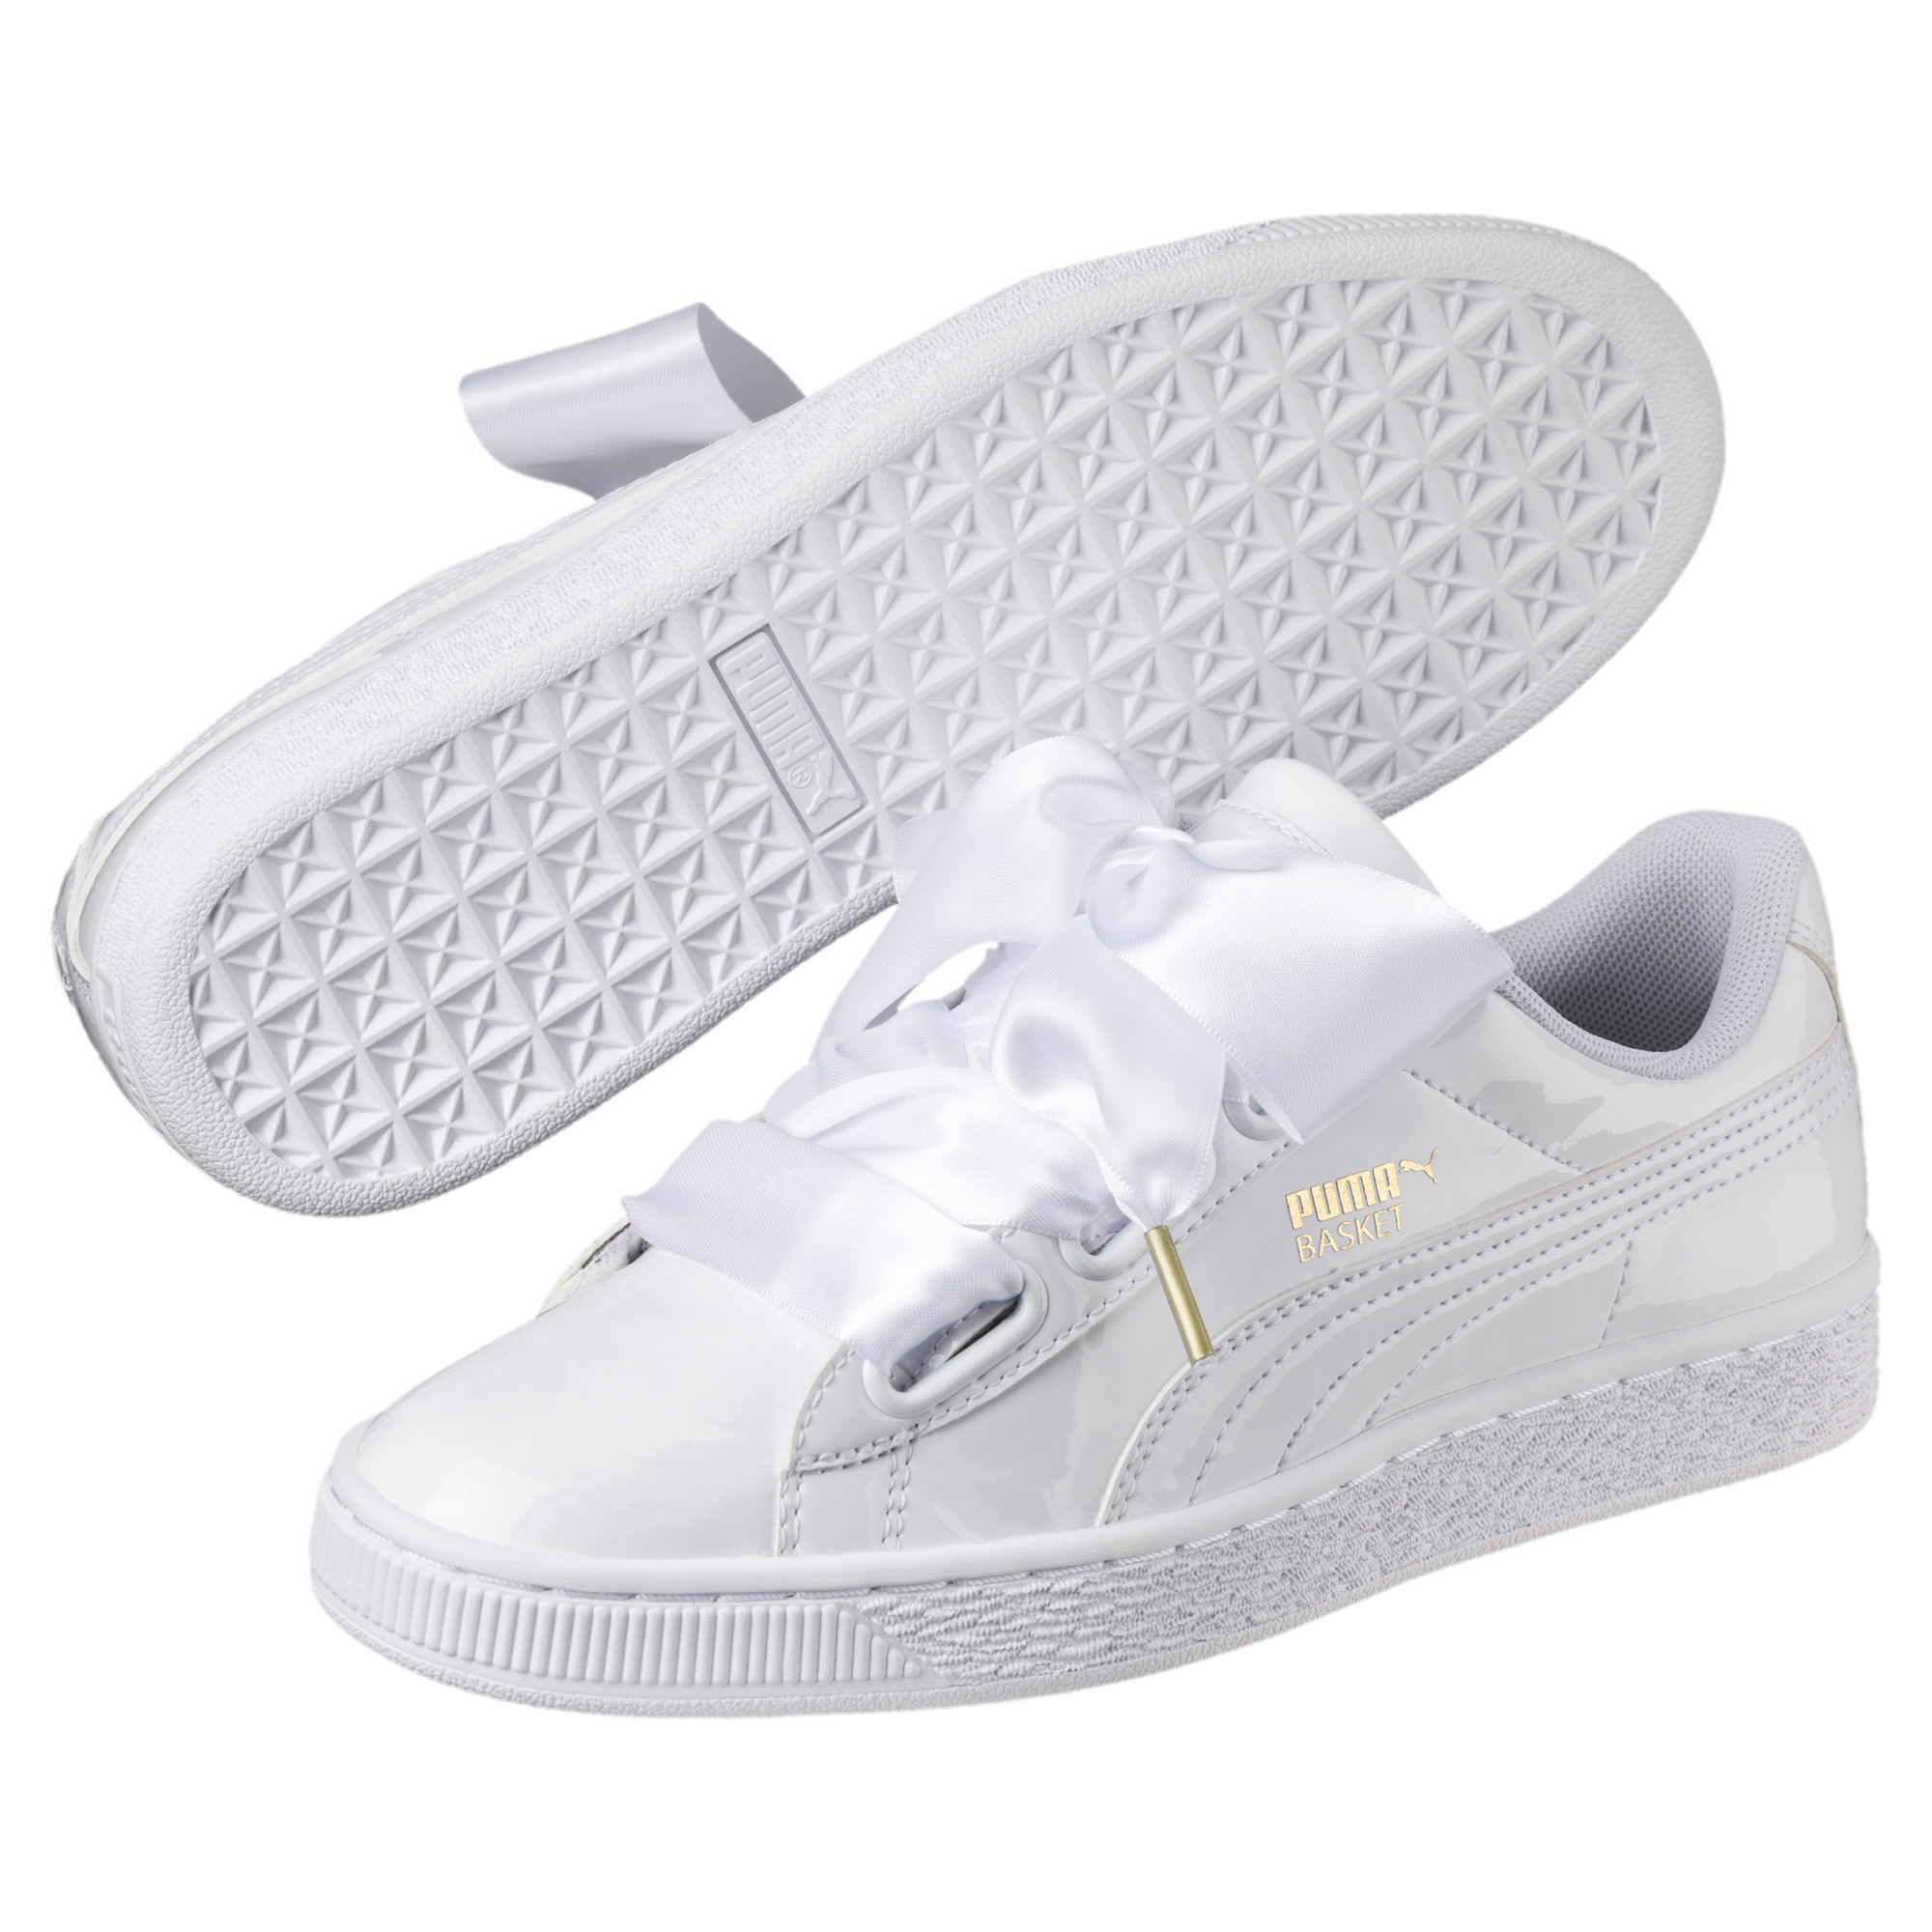 Details zu PUMA Basket Heart Patent Damen Sneaker Frauen Schuhe Sport Classics Neu